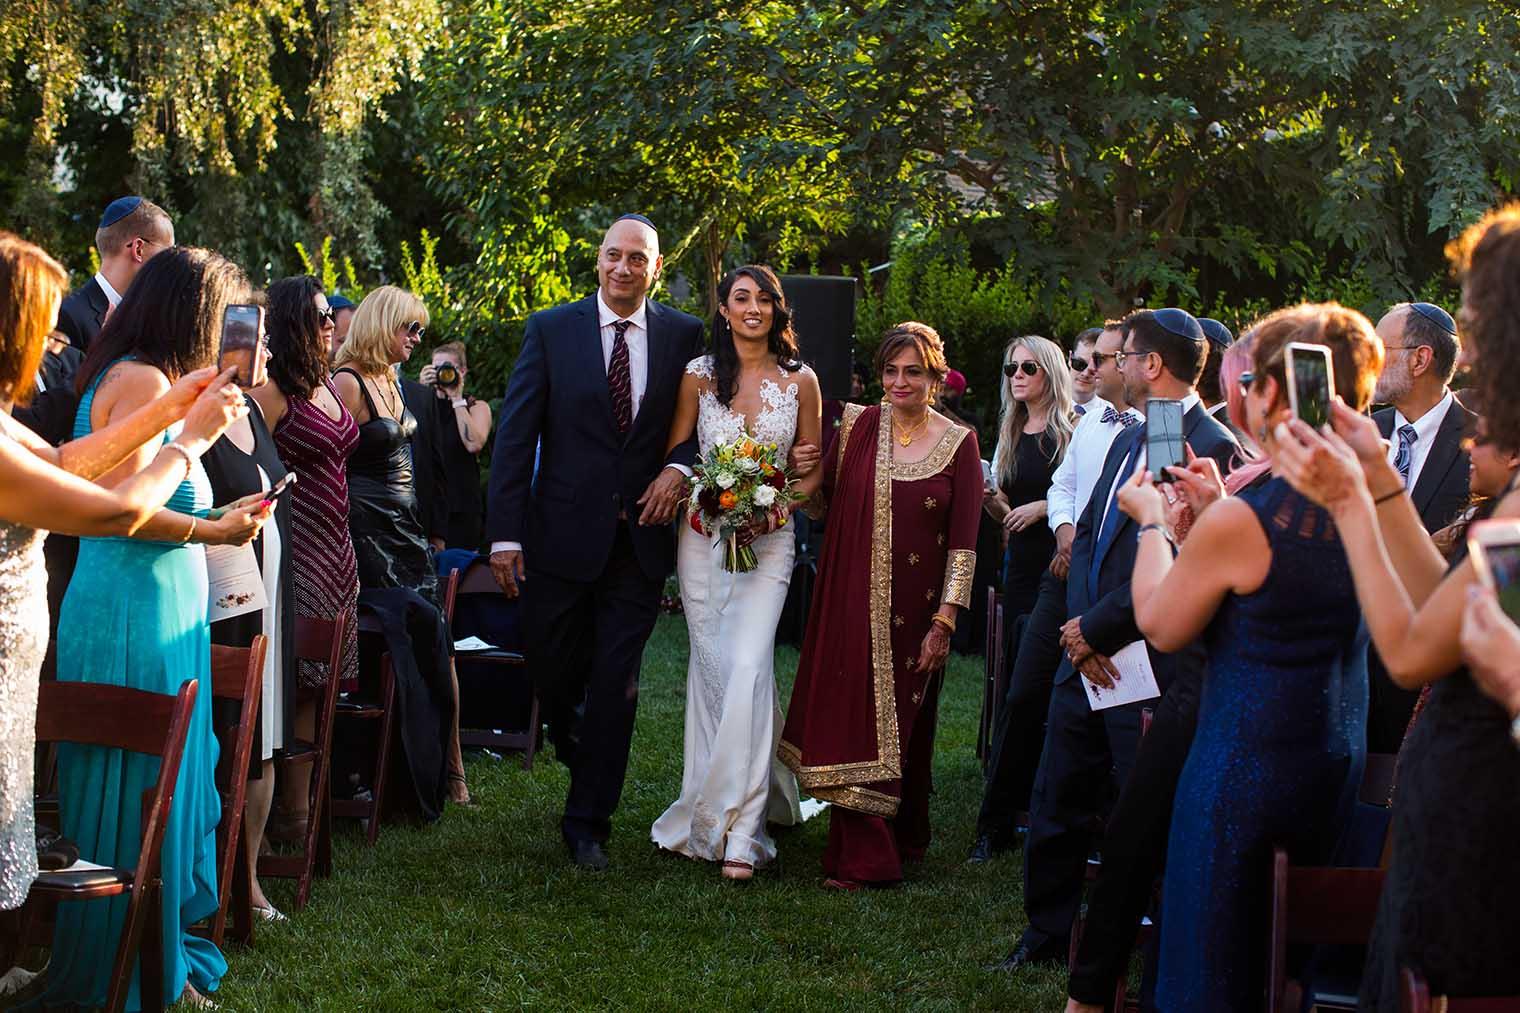 V. Sattui Winery Wedding Ceremony